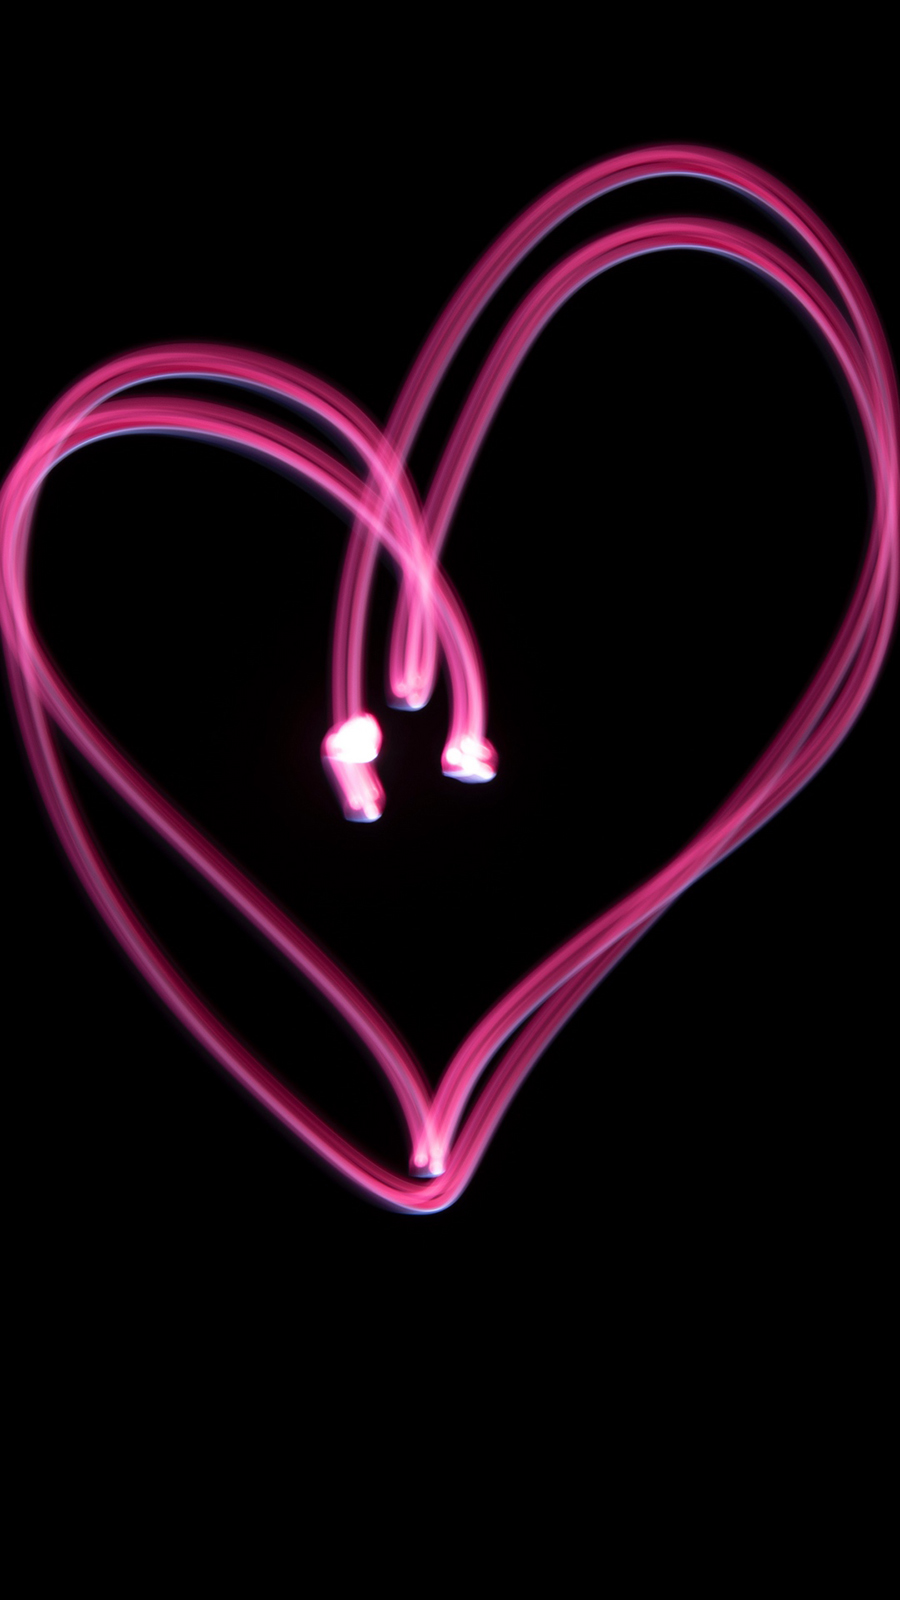 Heart Neon HD Wallpapers Free Download